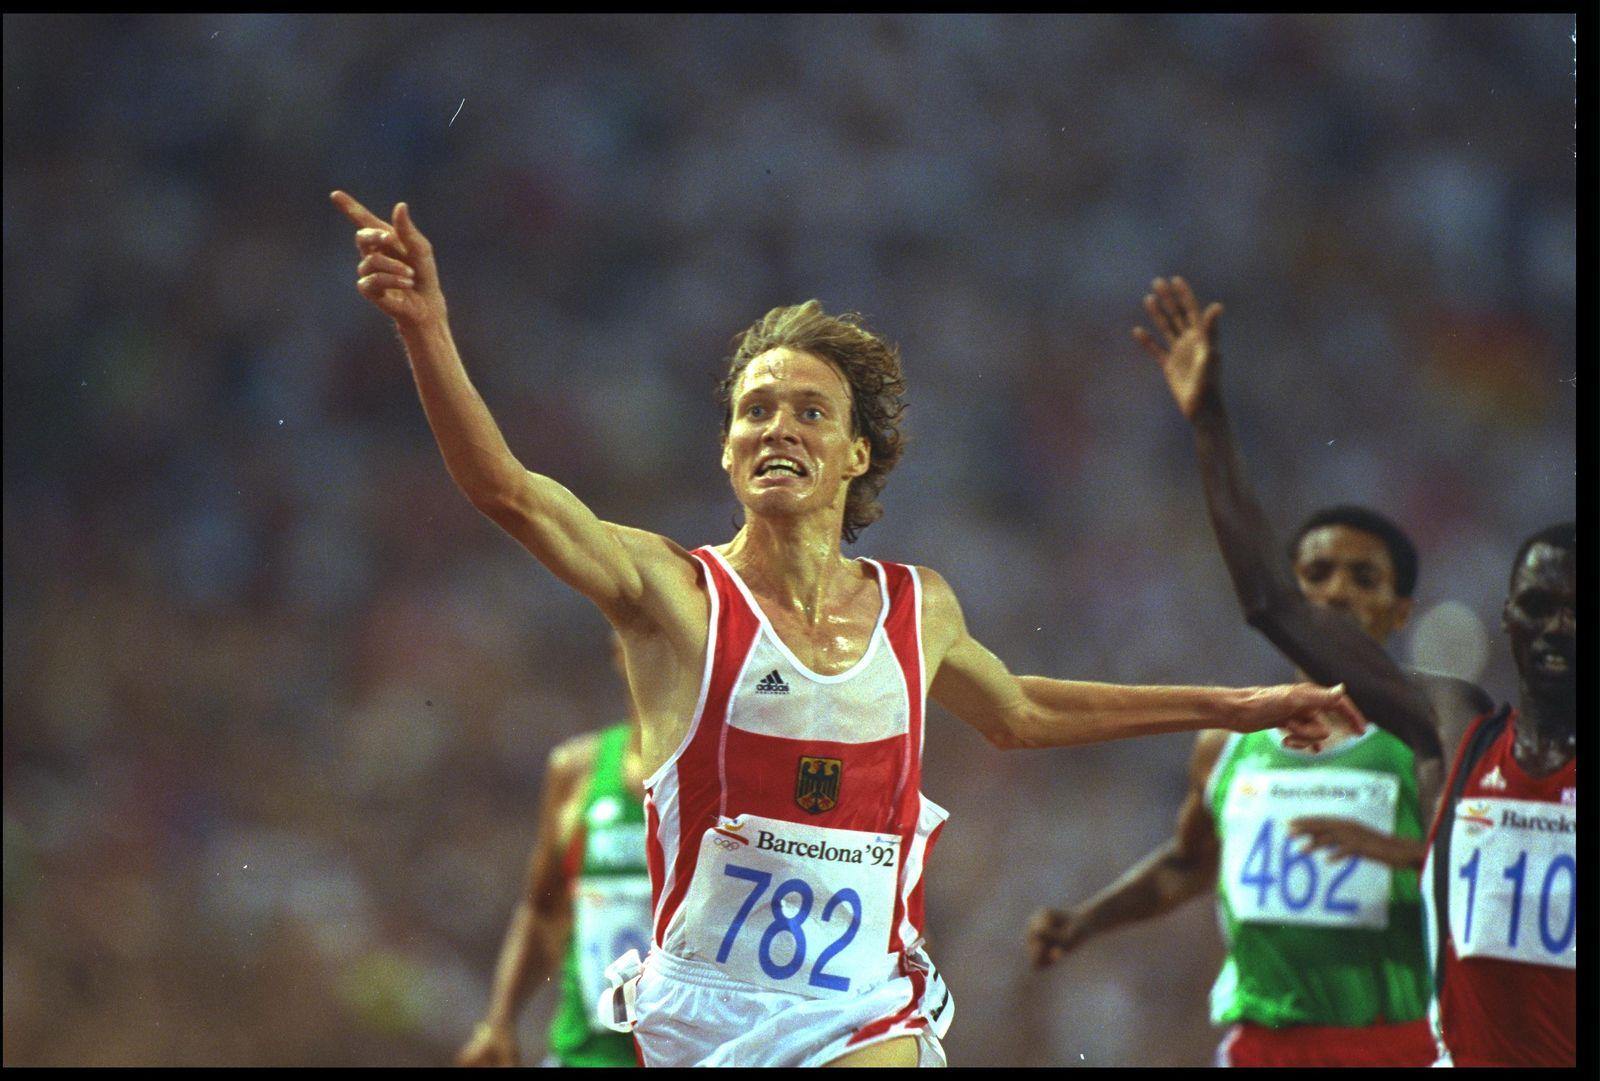 Dieter Baumann Olympia 1992